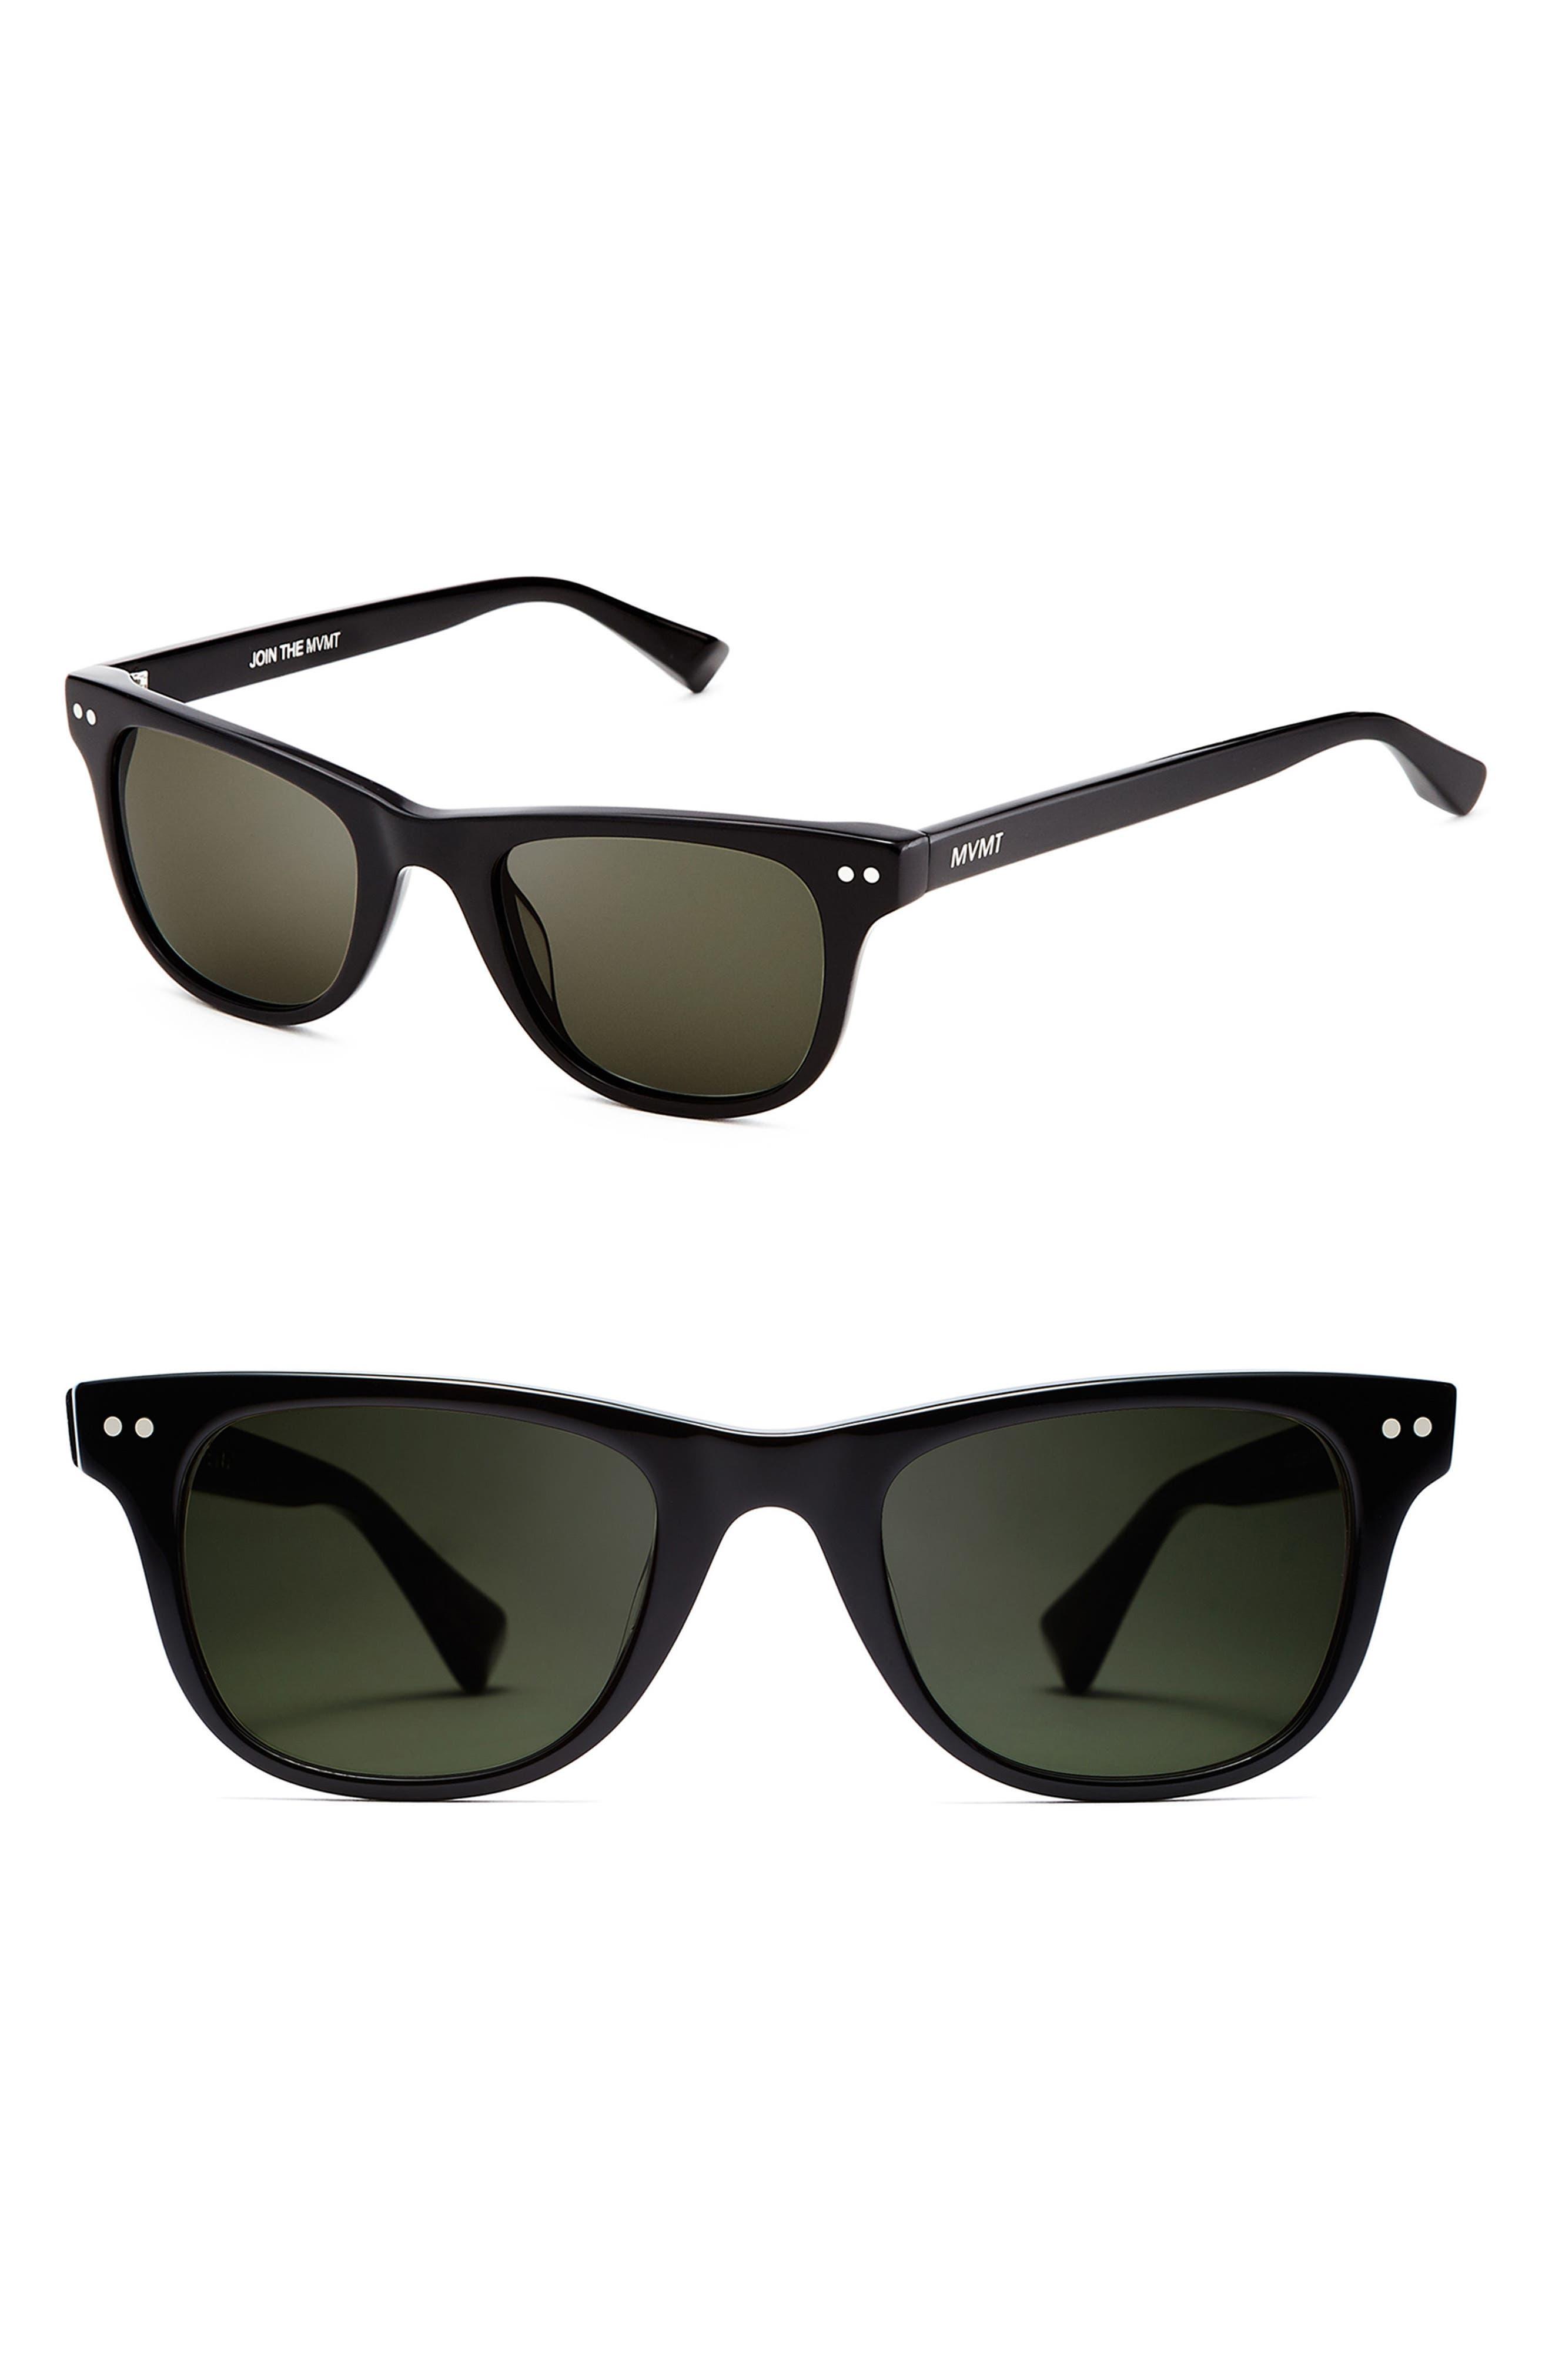 Outsider 51mm Sunglasses,                         Main,                         color, PURE BLACK